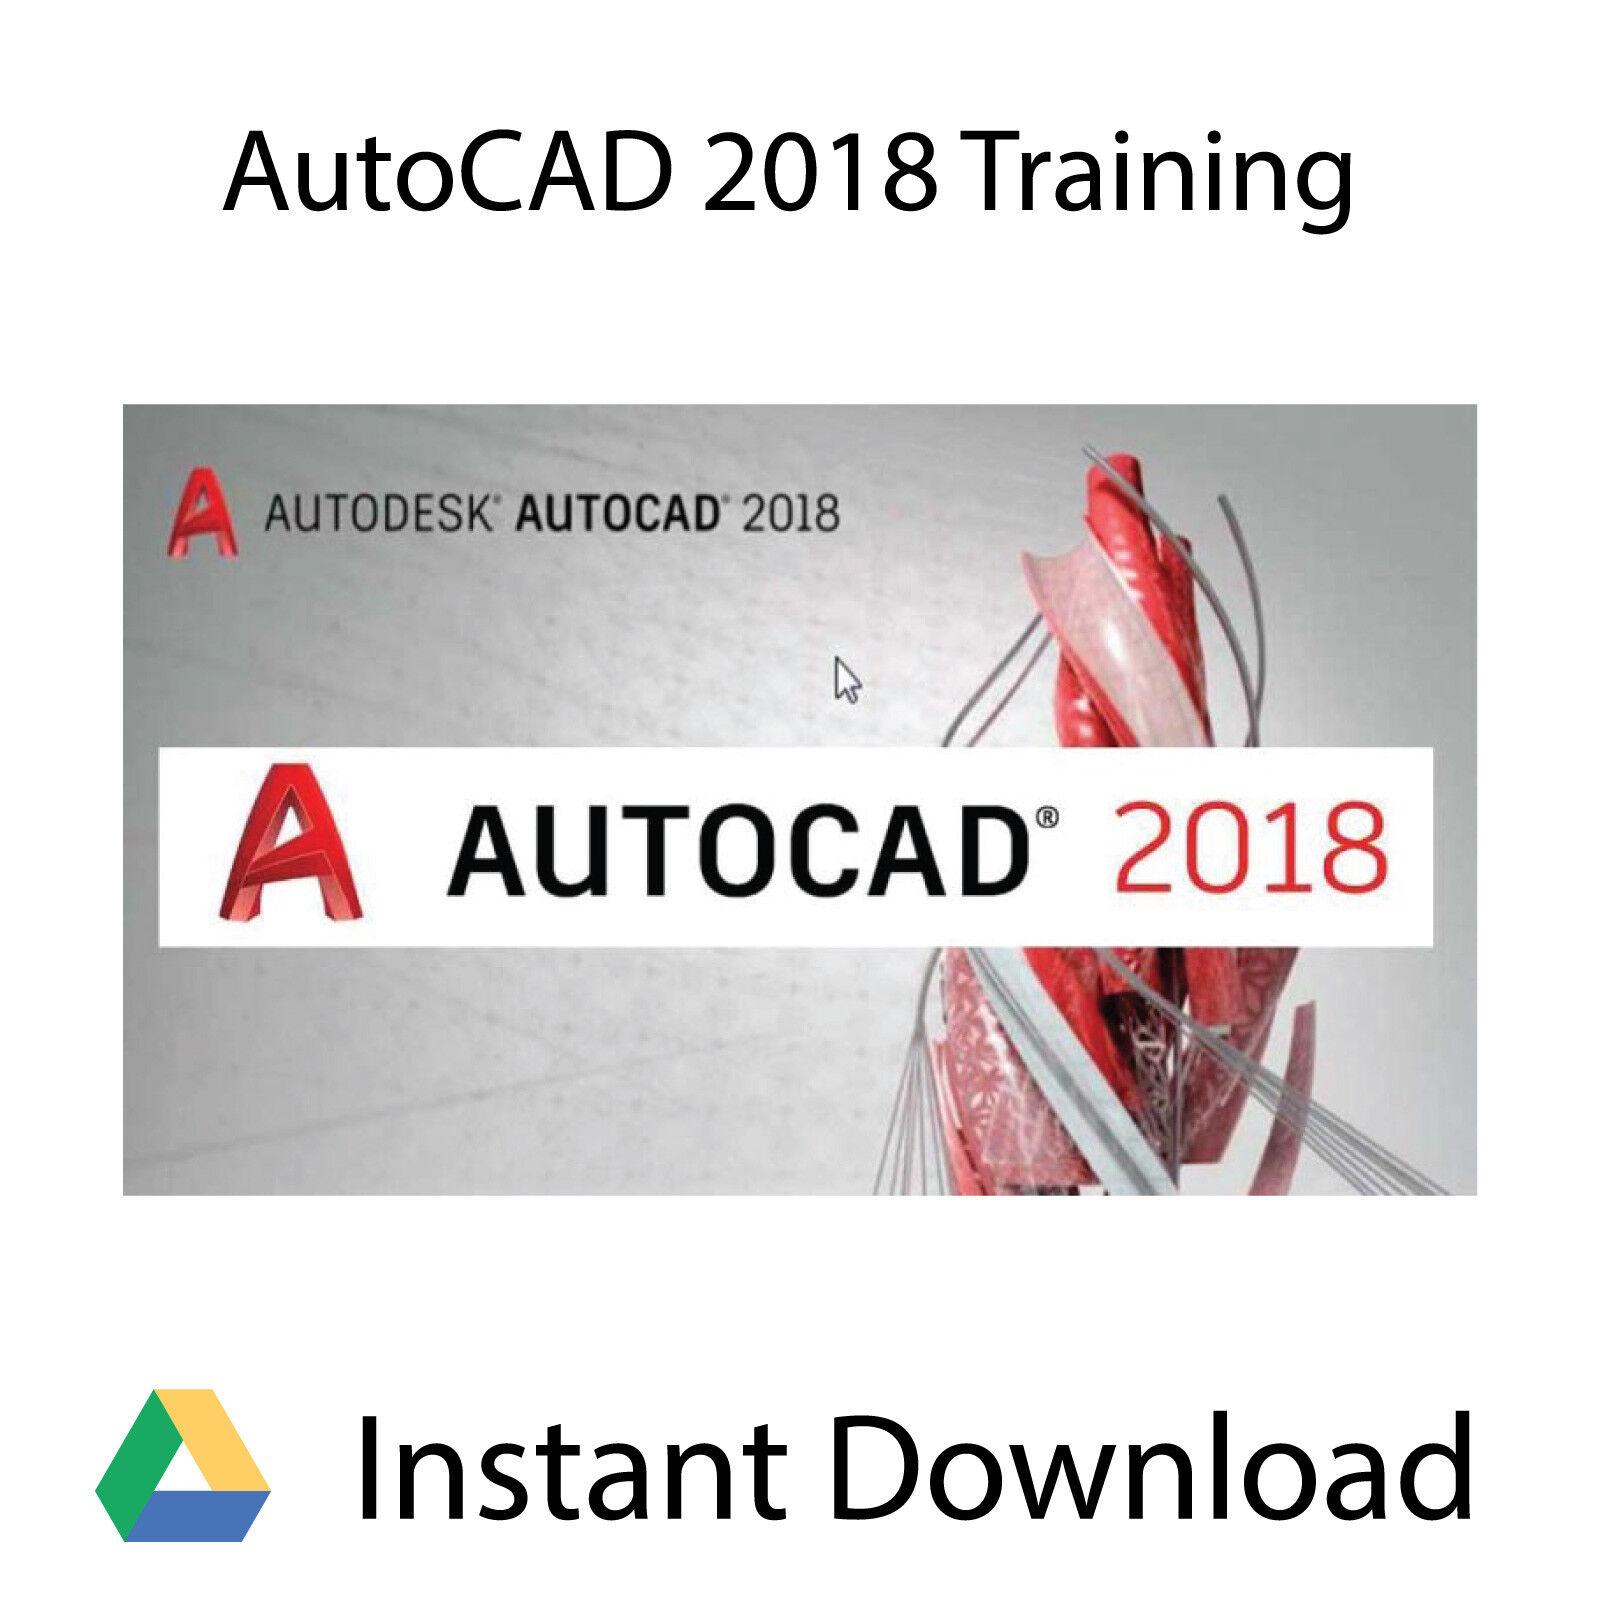 Autodesk AutoCAD 2018 Professional Video Training Tutorial - Instant Download